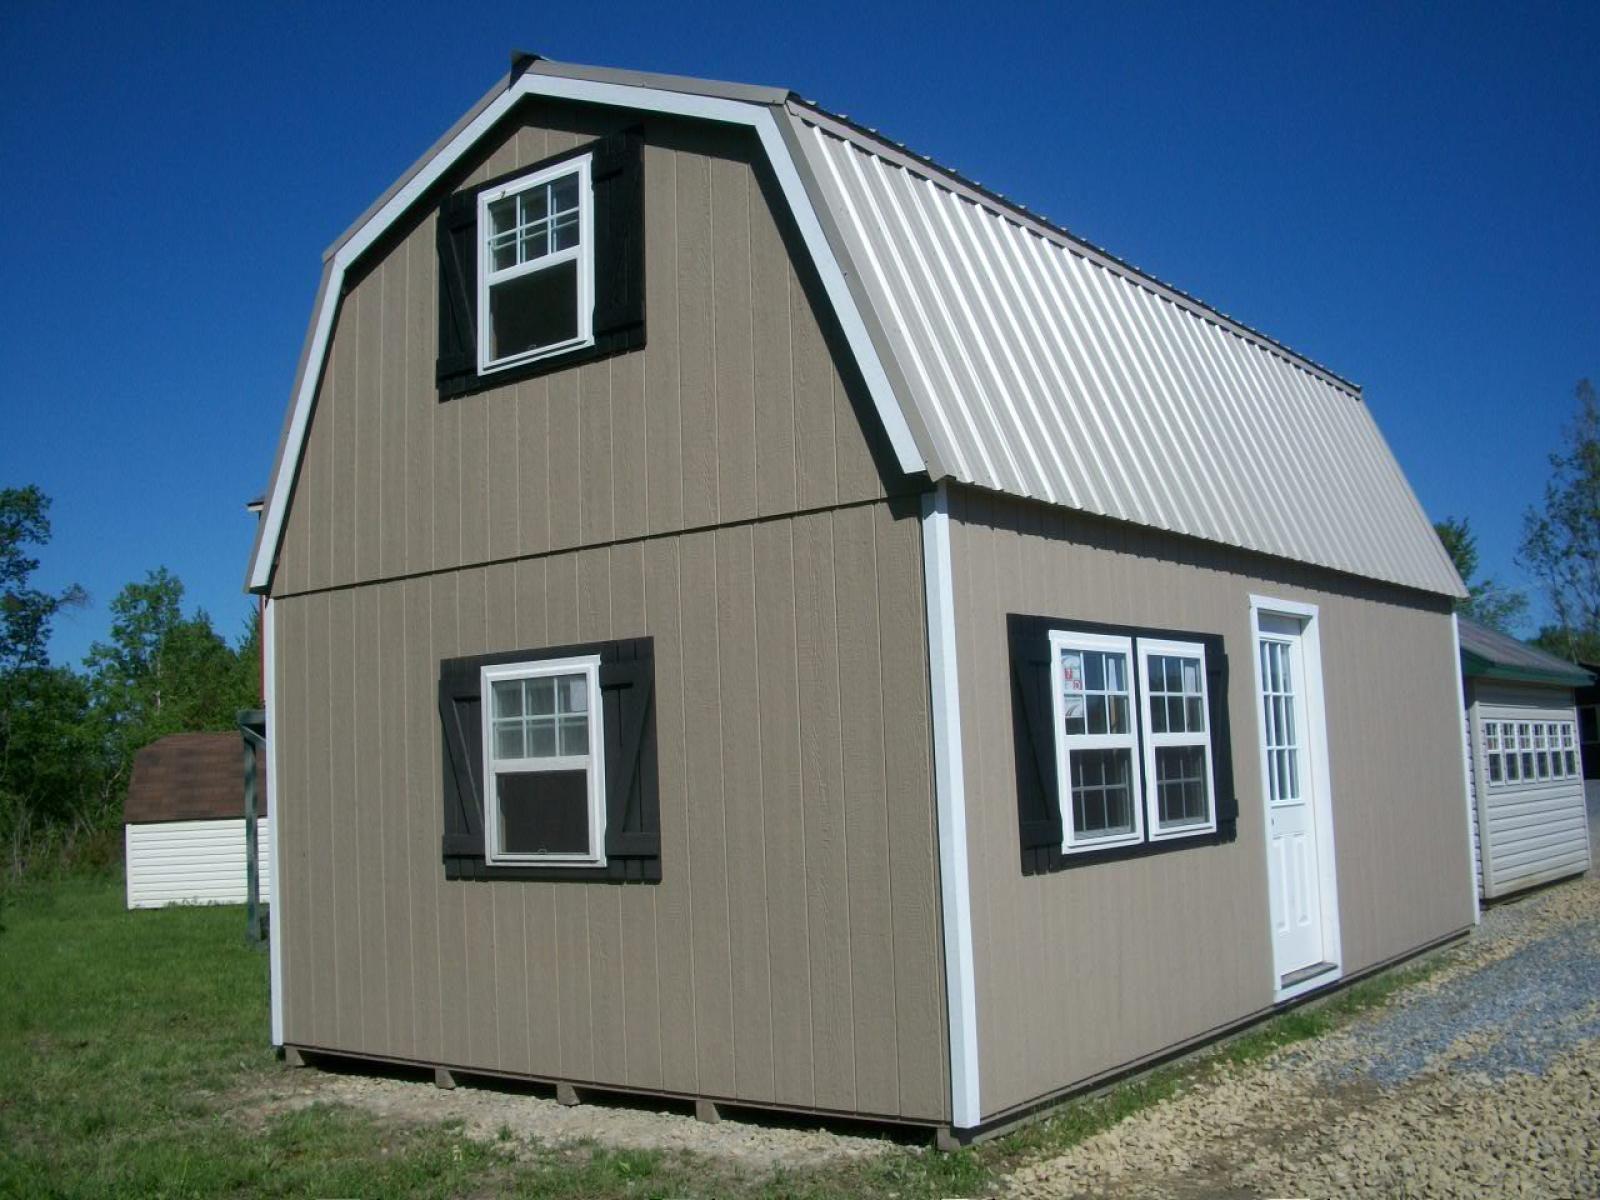 Home Depot Outdoor Storage Barn Summer Wind 16 x 16 SKU 624 043